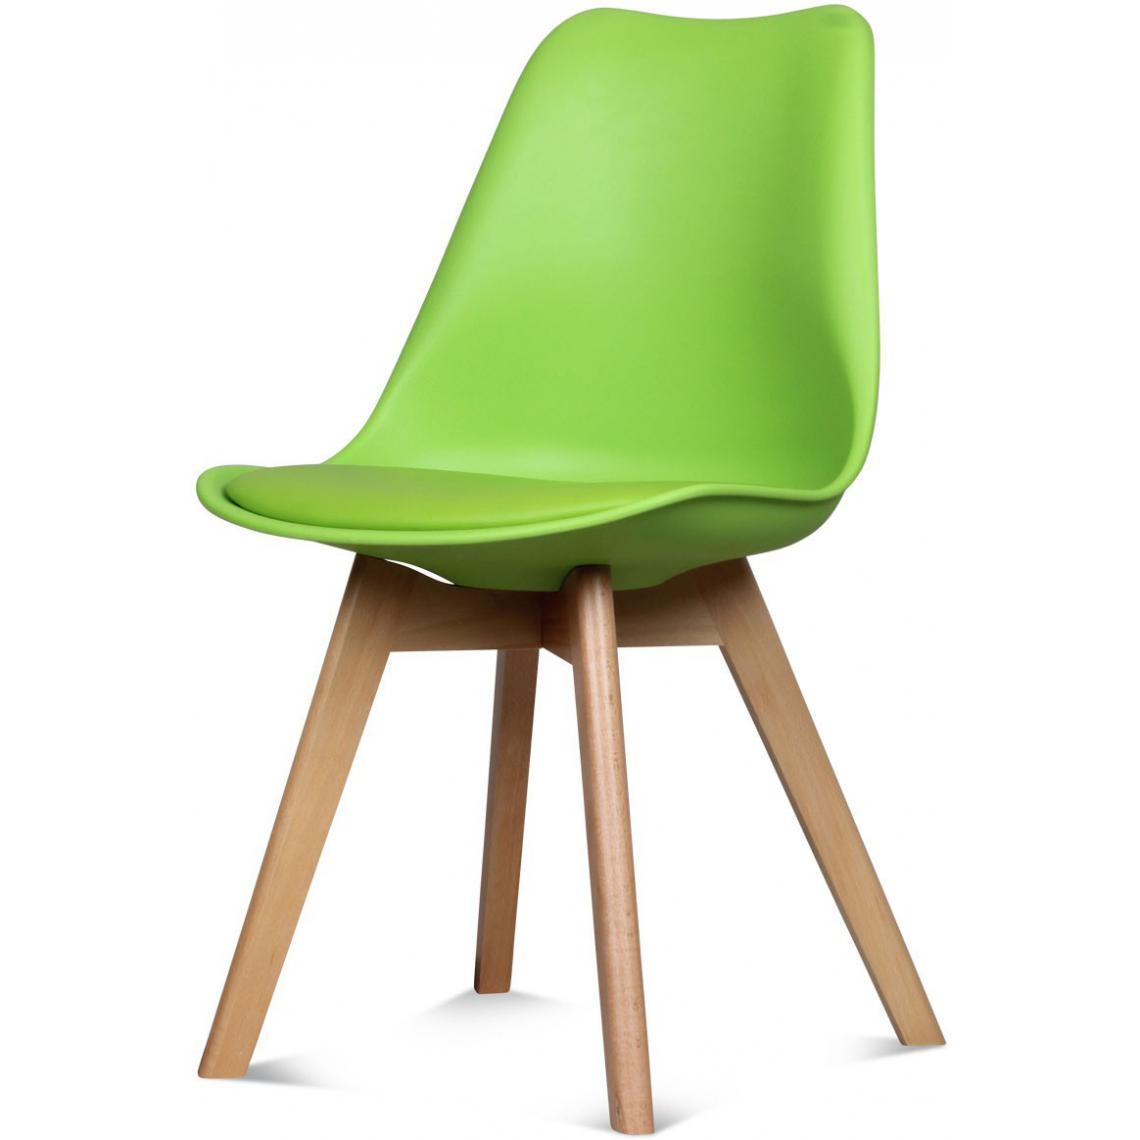 chaise design style scandinave vert esben 3 suisses. Black Bedroom Furniture Sets. Home Design Ideas